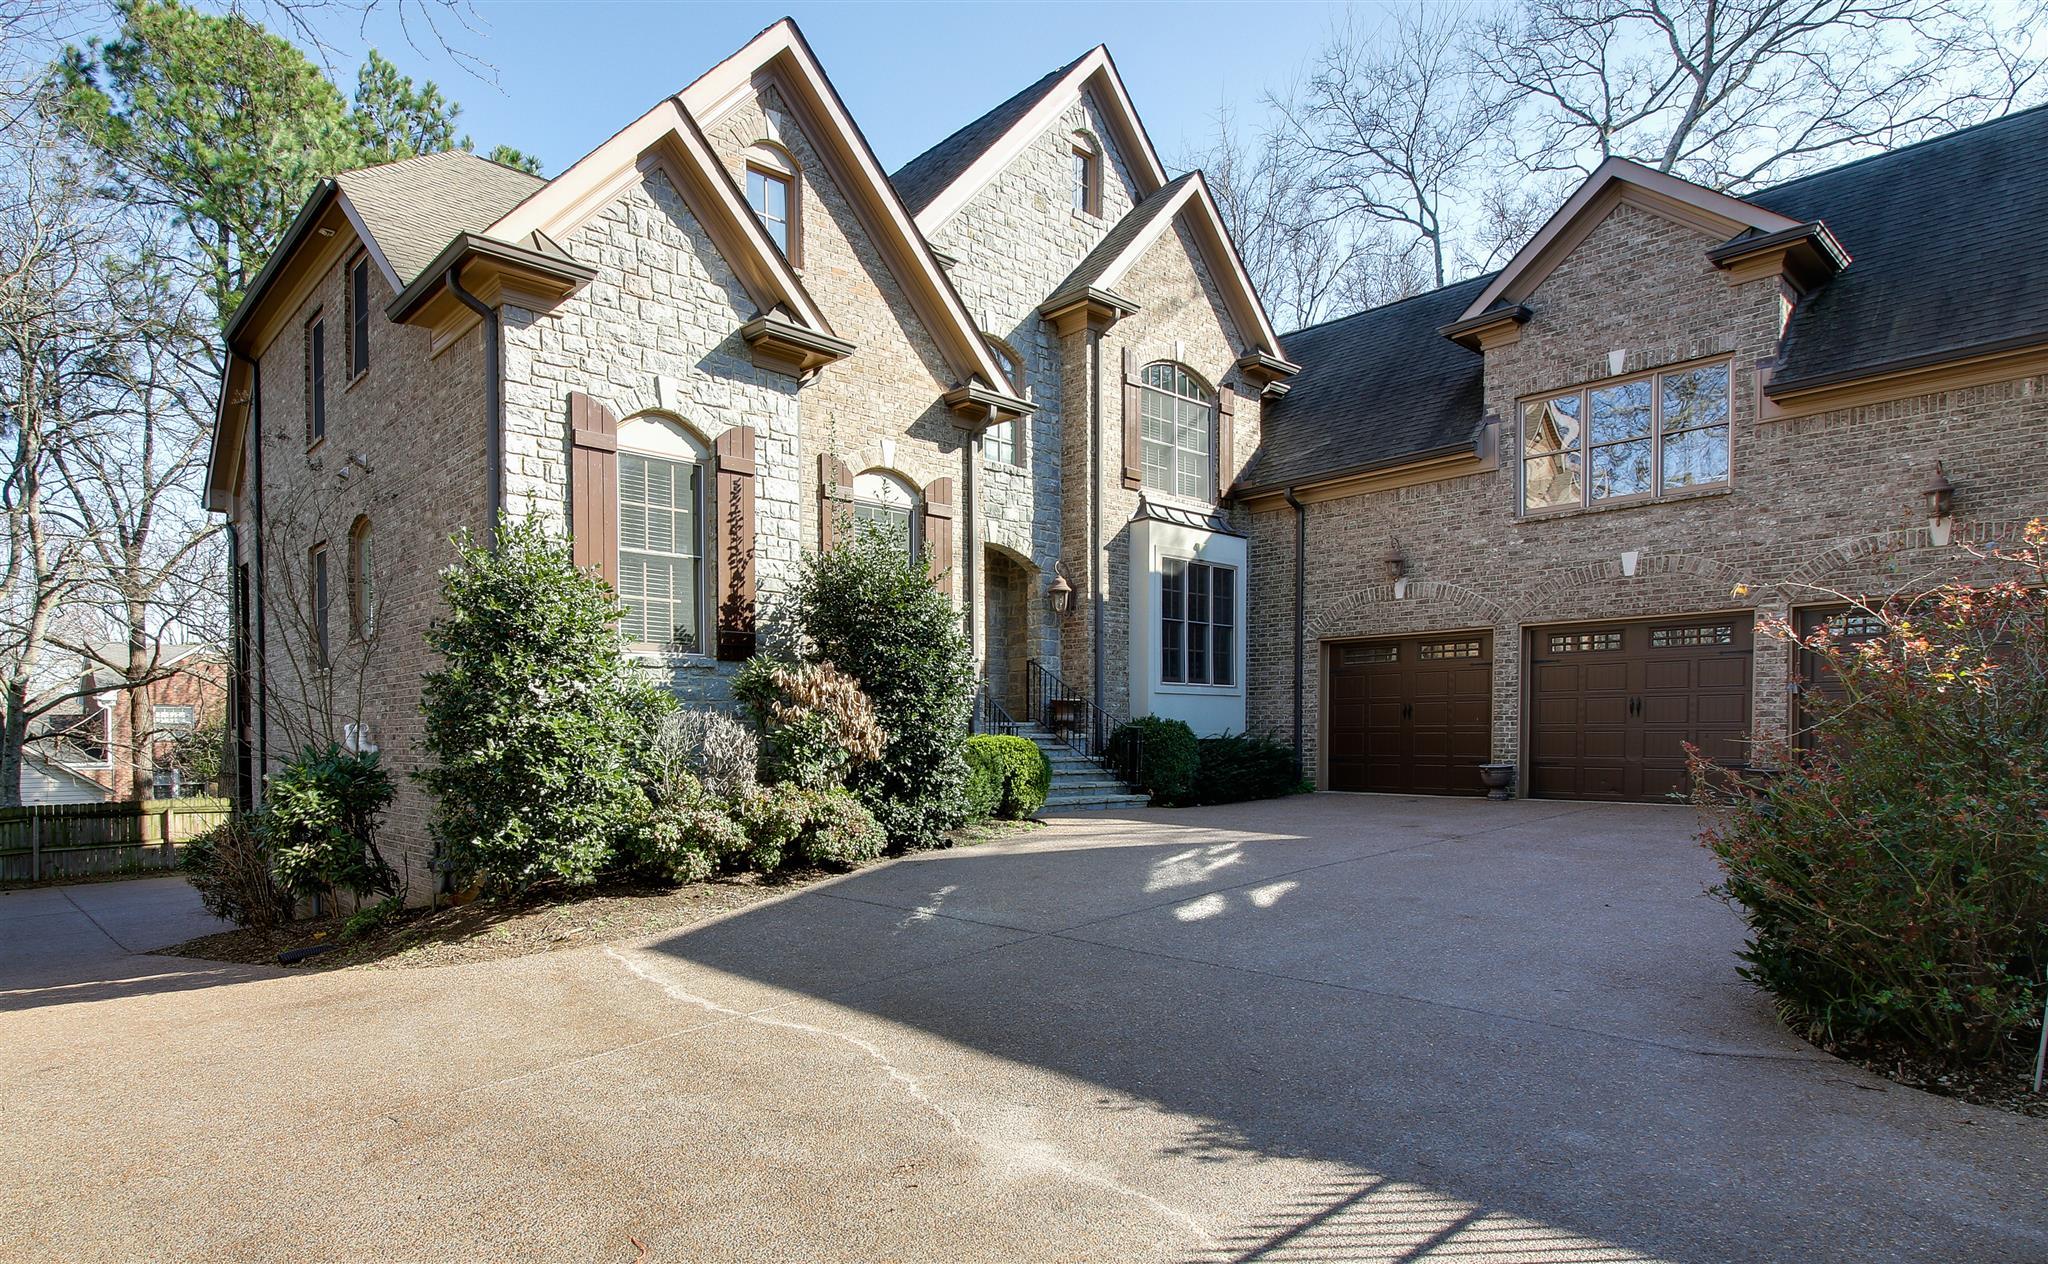 4222 Jamesborough Pl, Nashville, TN 37215